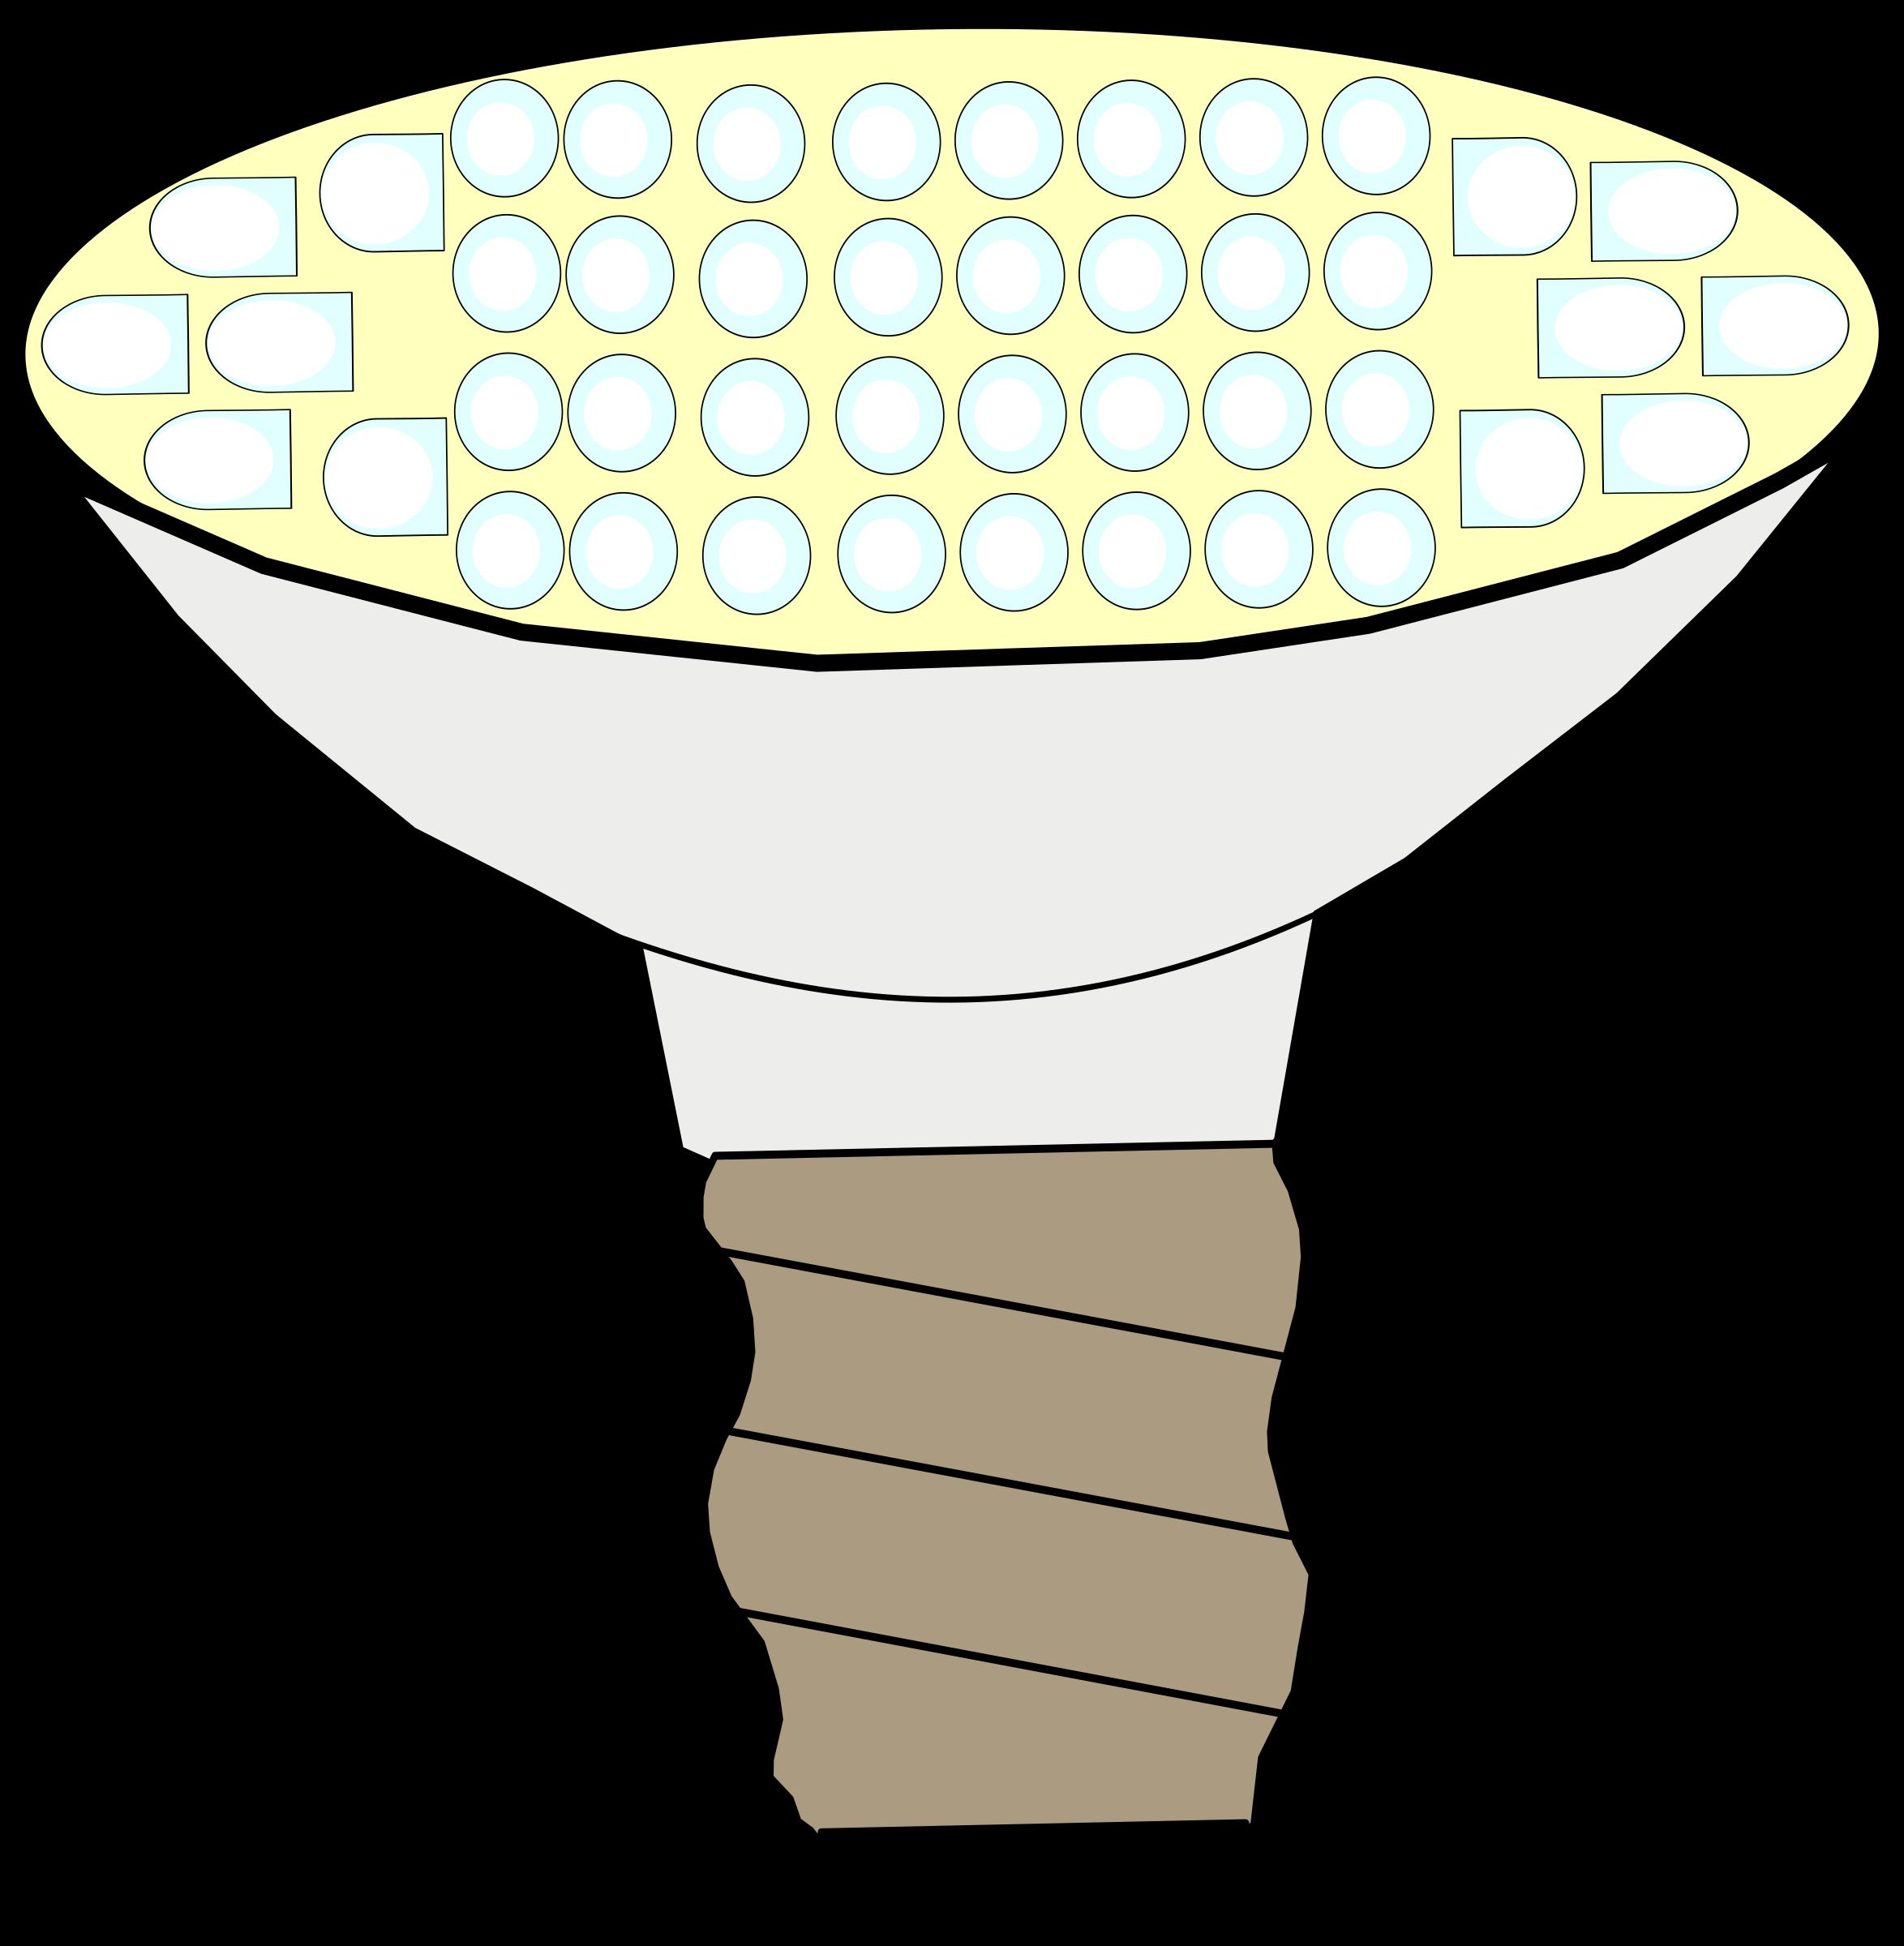 Lamp clipart brain.  great led light